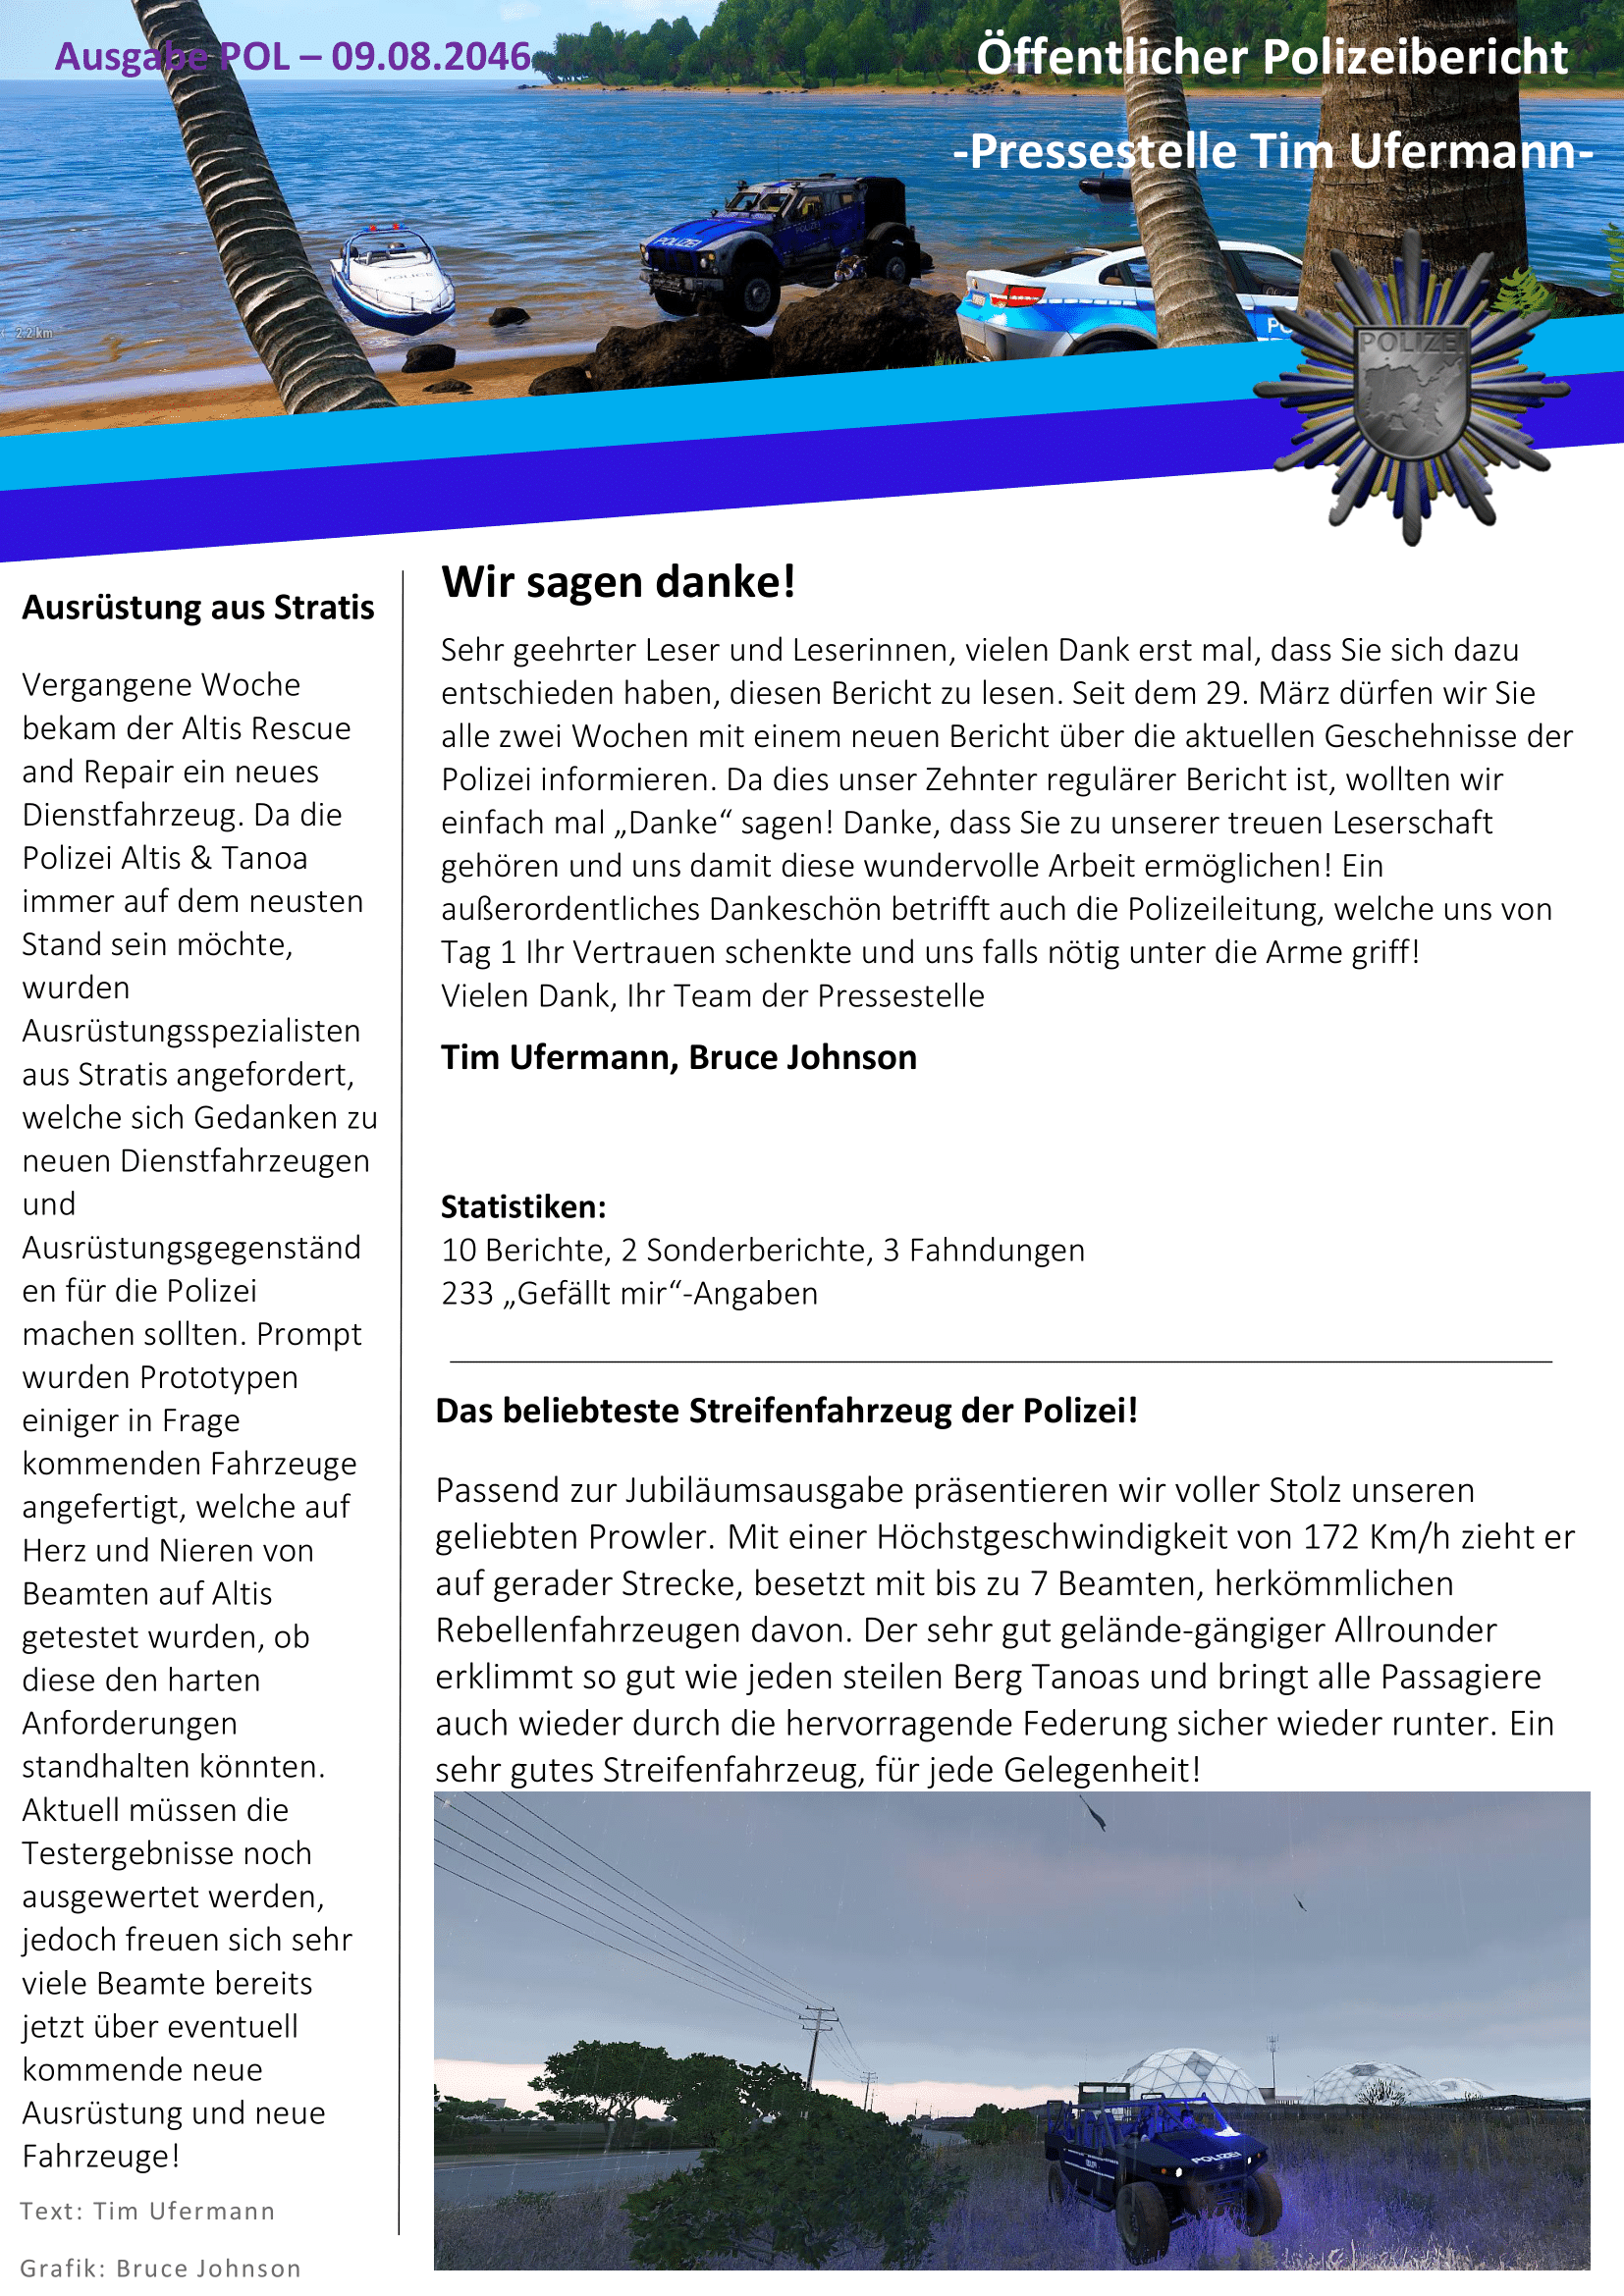 POL10-11.png